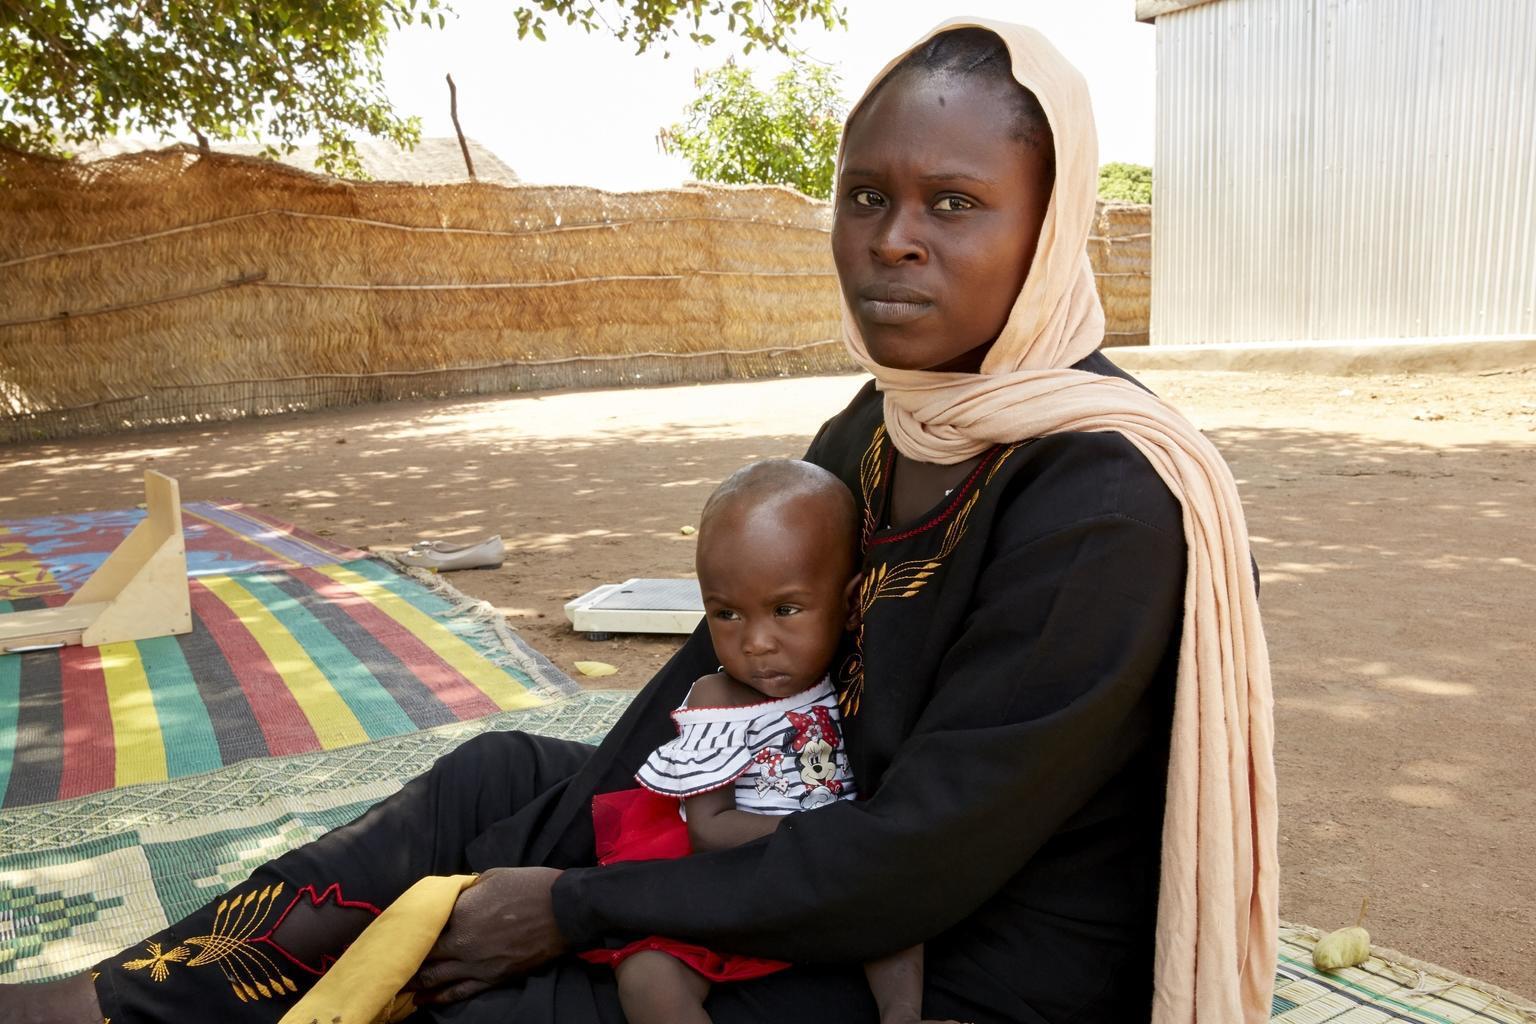 Bild zu Amira, Südsudan, Mangelernährung